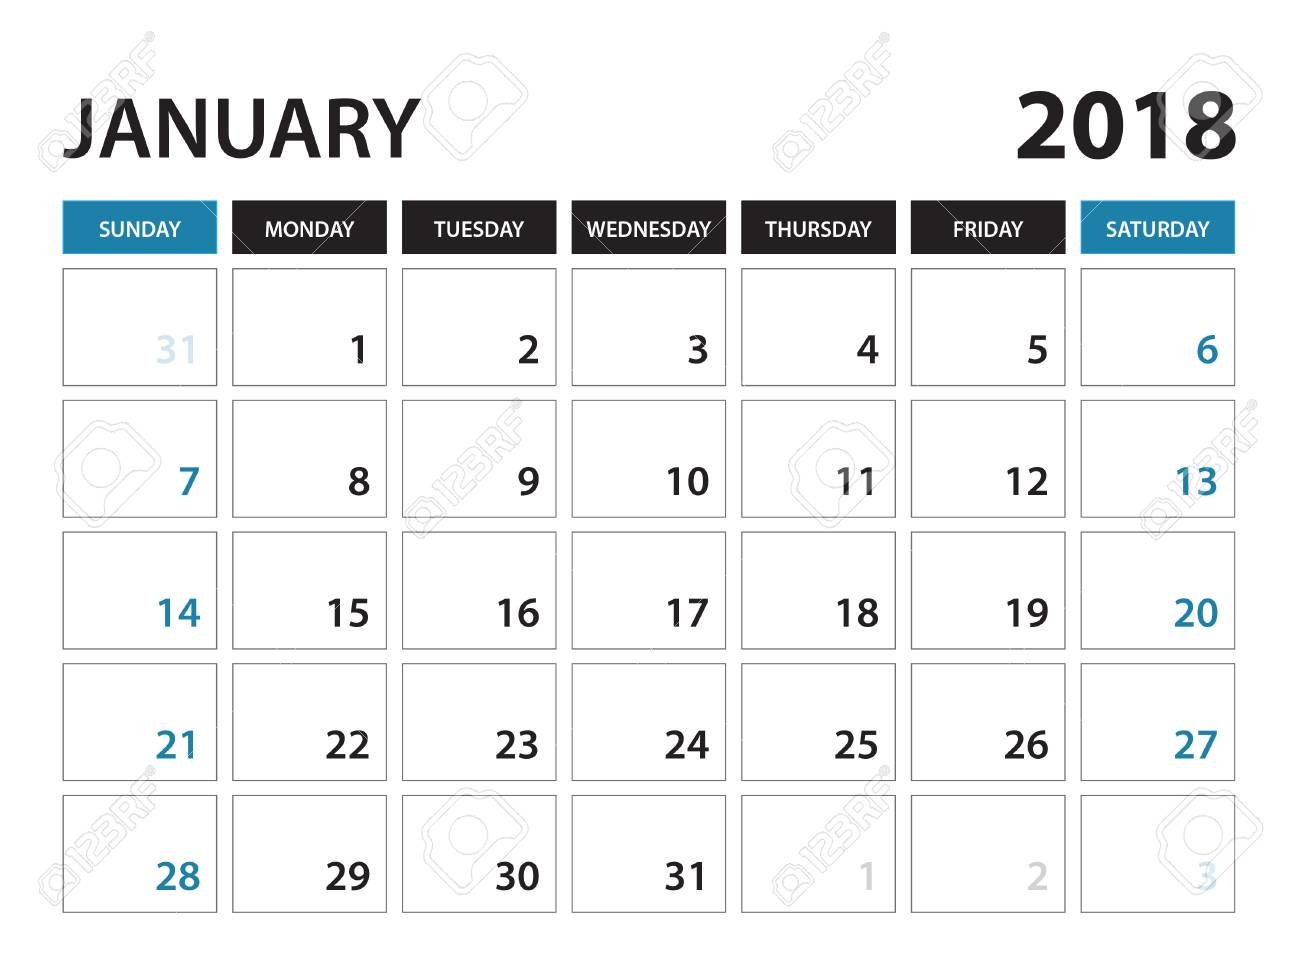 Printable Calendar For January 2018 Planner Design Template Week Starts On Sunday Stationery